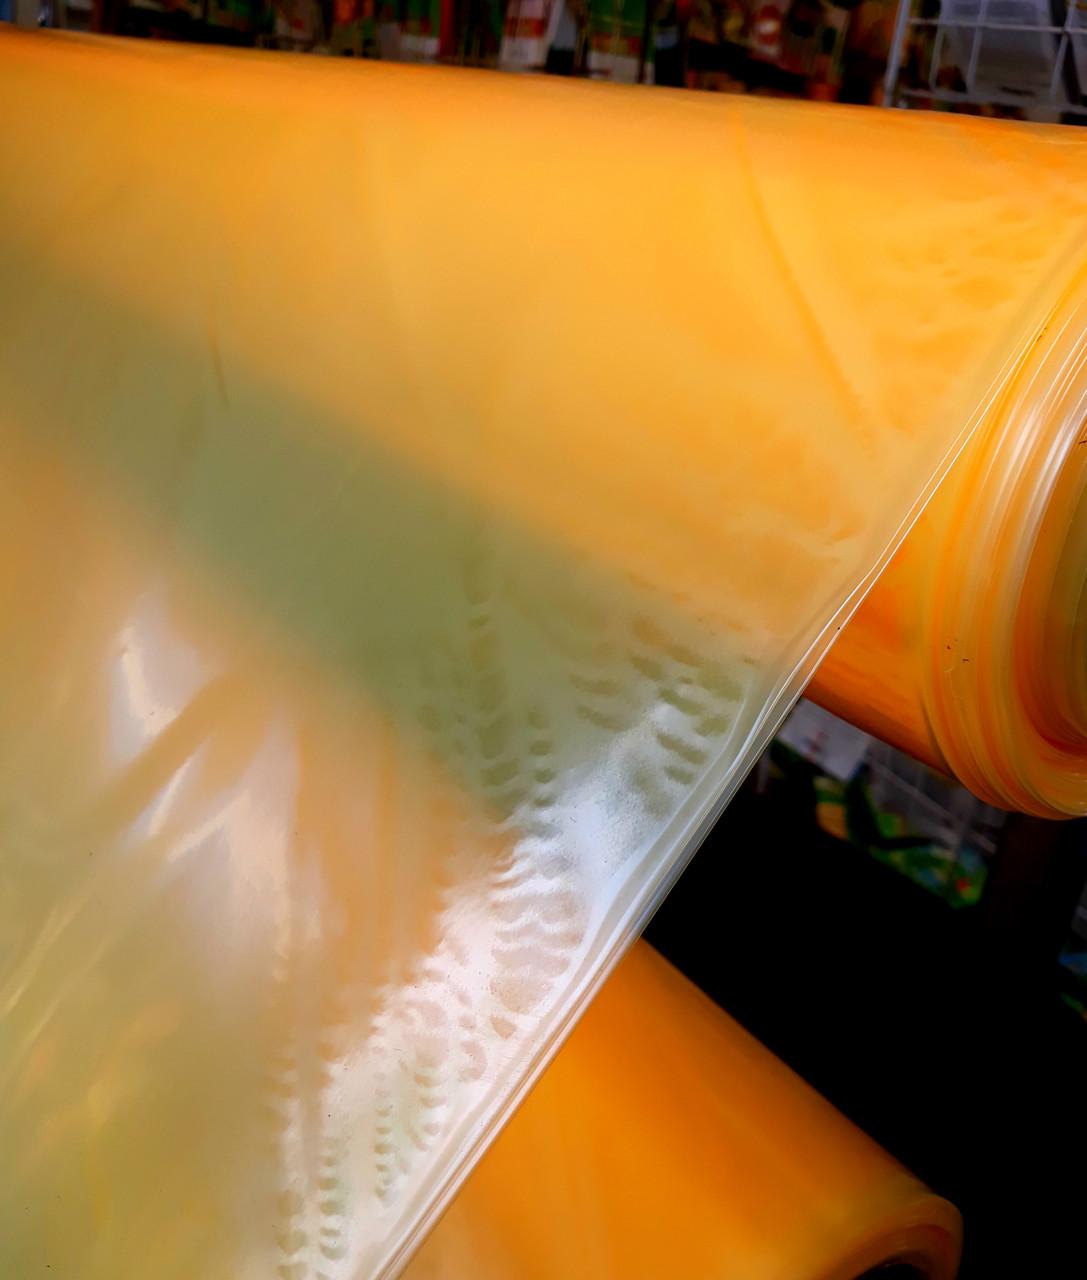 Пленка тепличная на метраж 150мкм, 6м ширина, уф-стаб. 24 месяца ,(оранжевая, синяя).